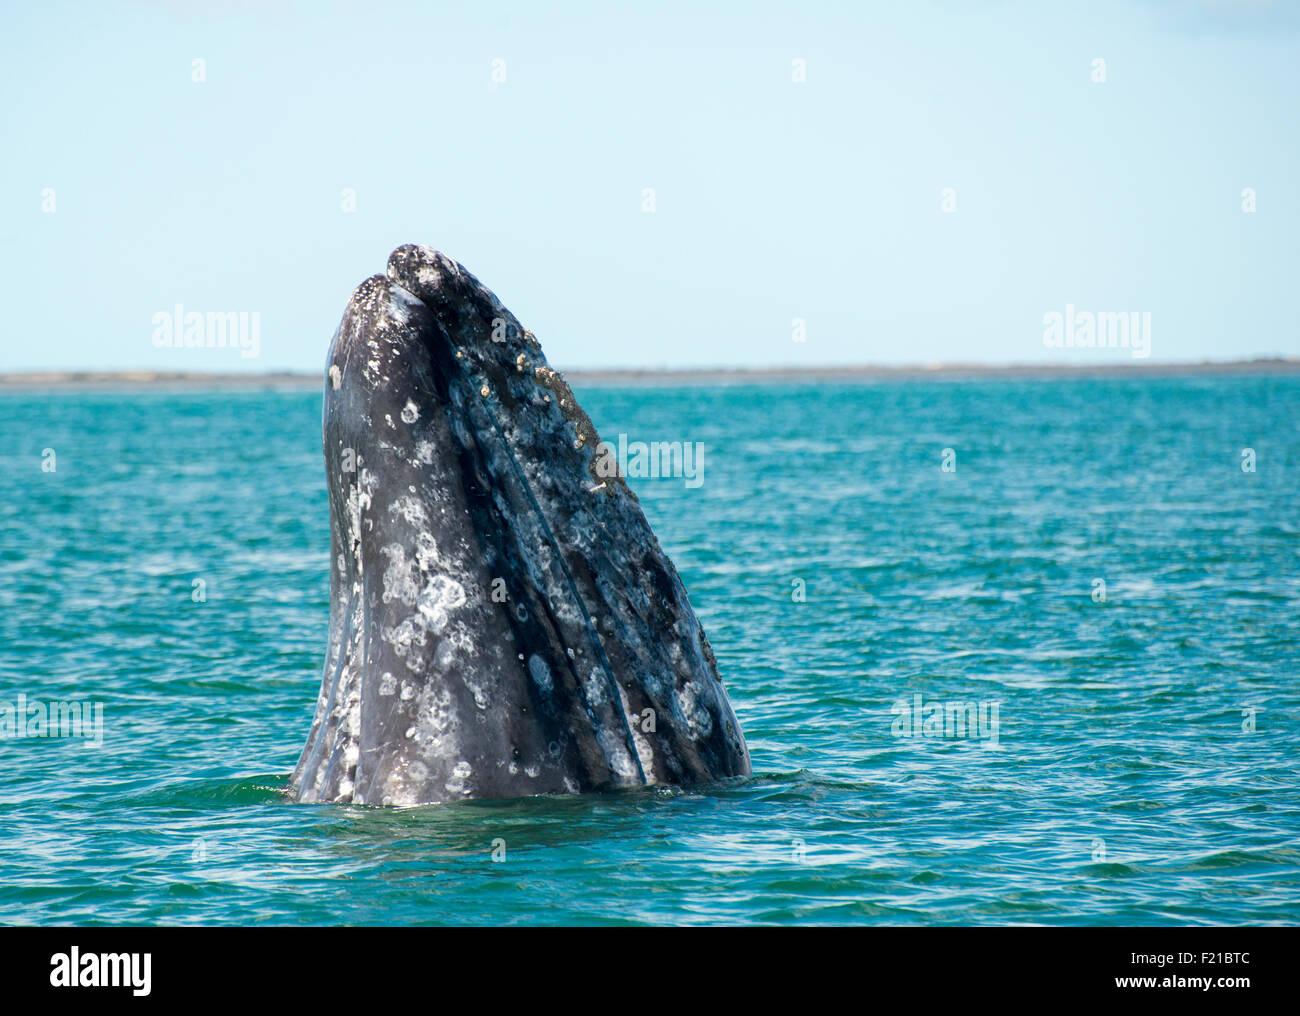 Mexico. San Ignacio Lagoon. Whale spyhopping. - Stock Image